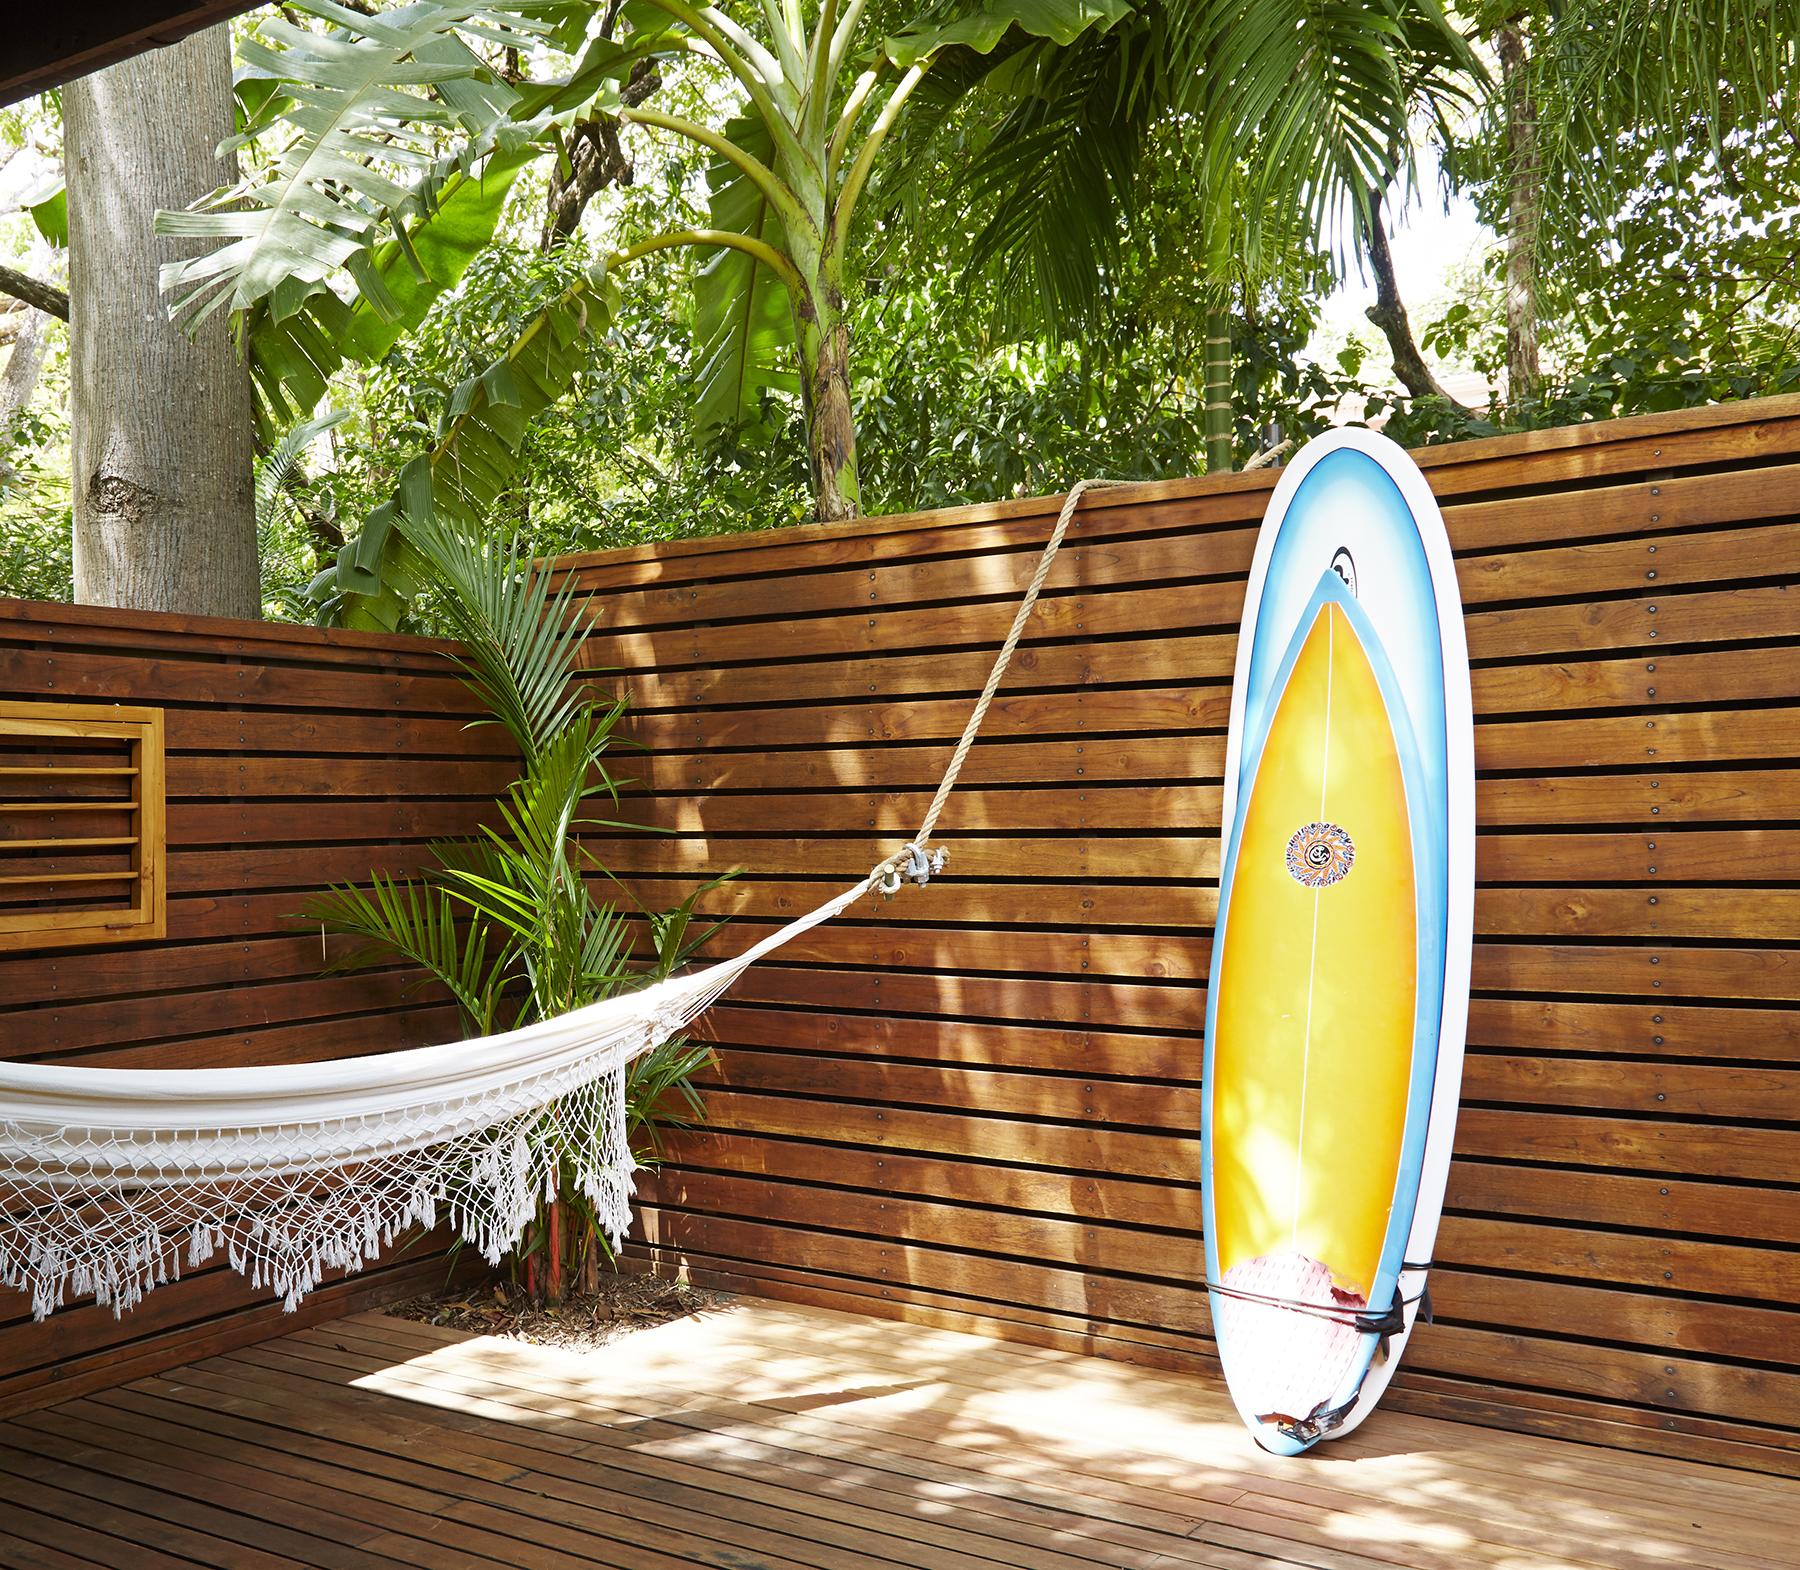 South_America_Costa_Rica_Nosara_Harmony_Hotel_Terrace.jpg